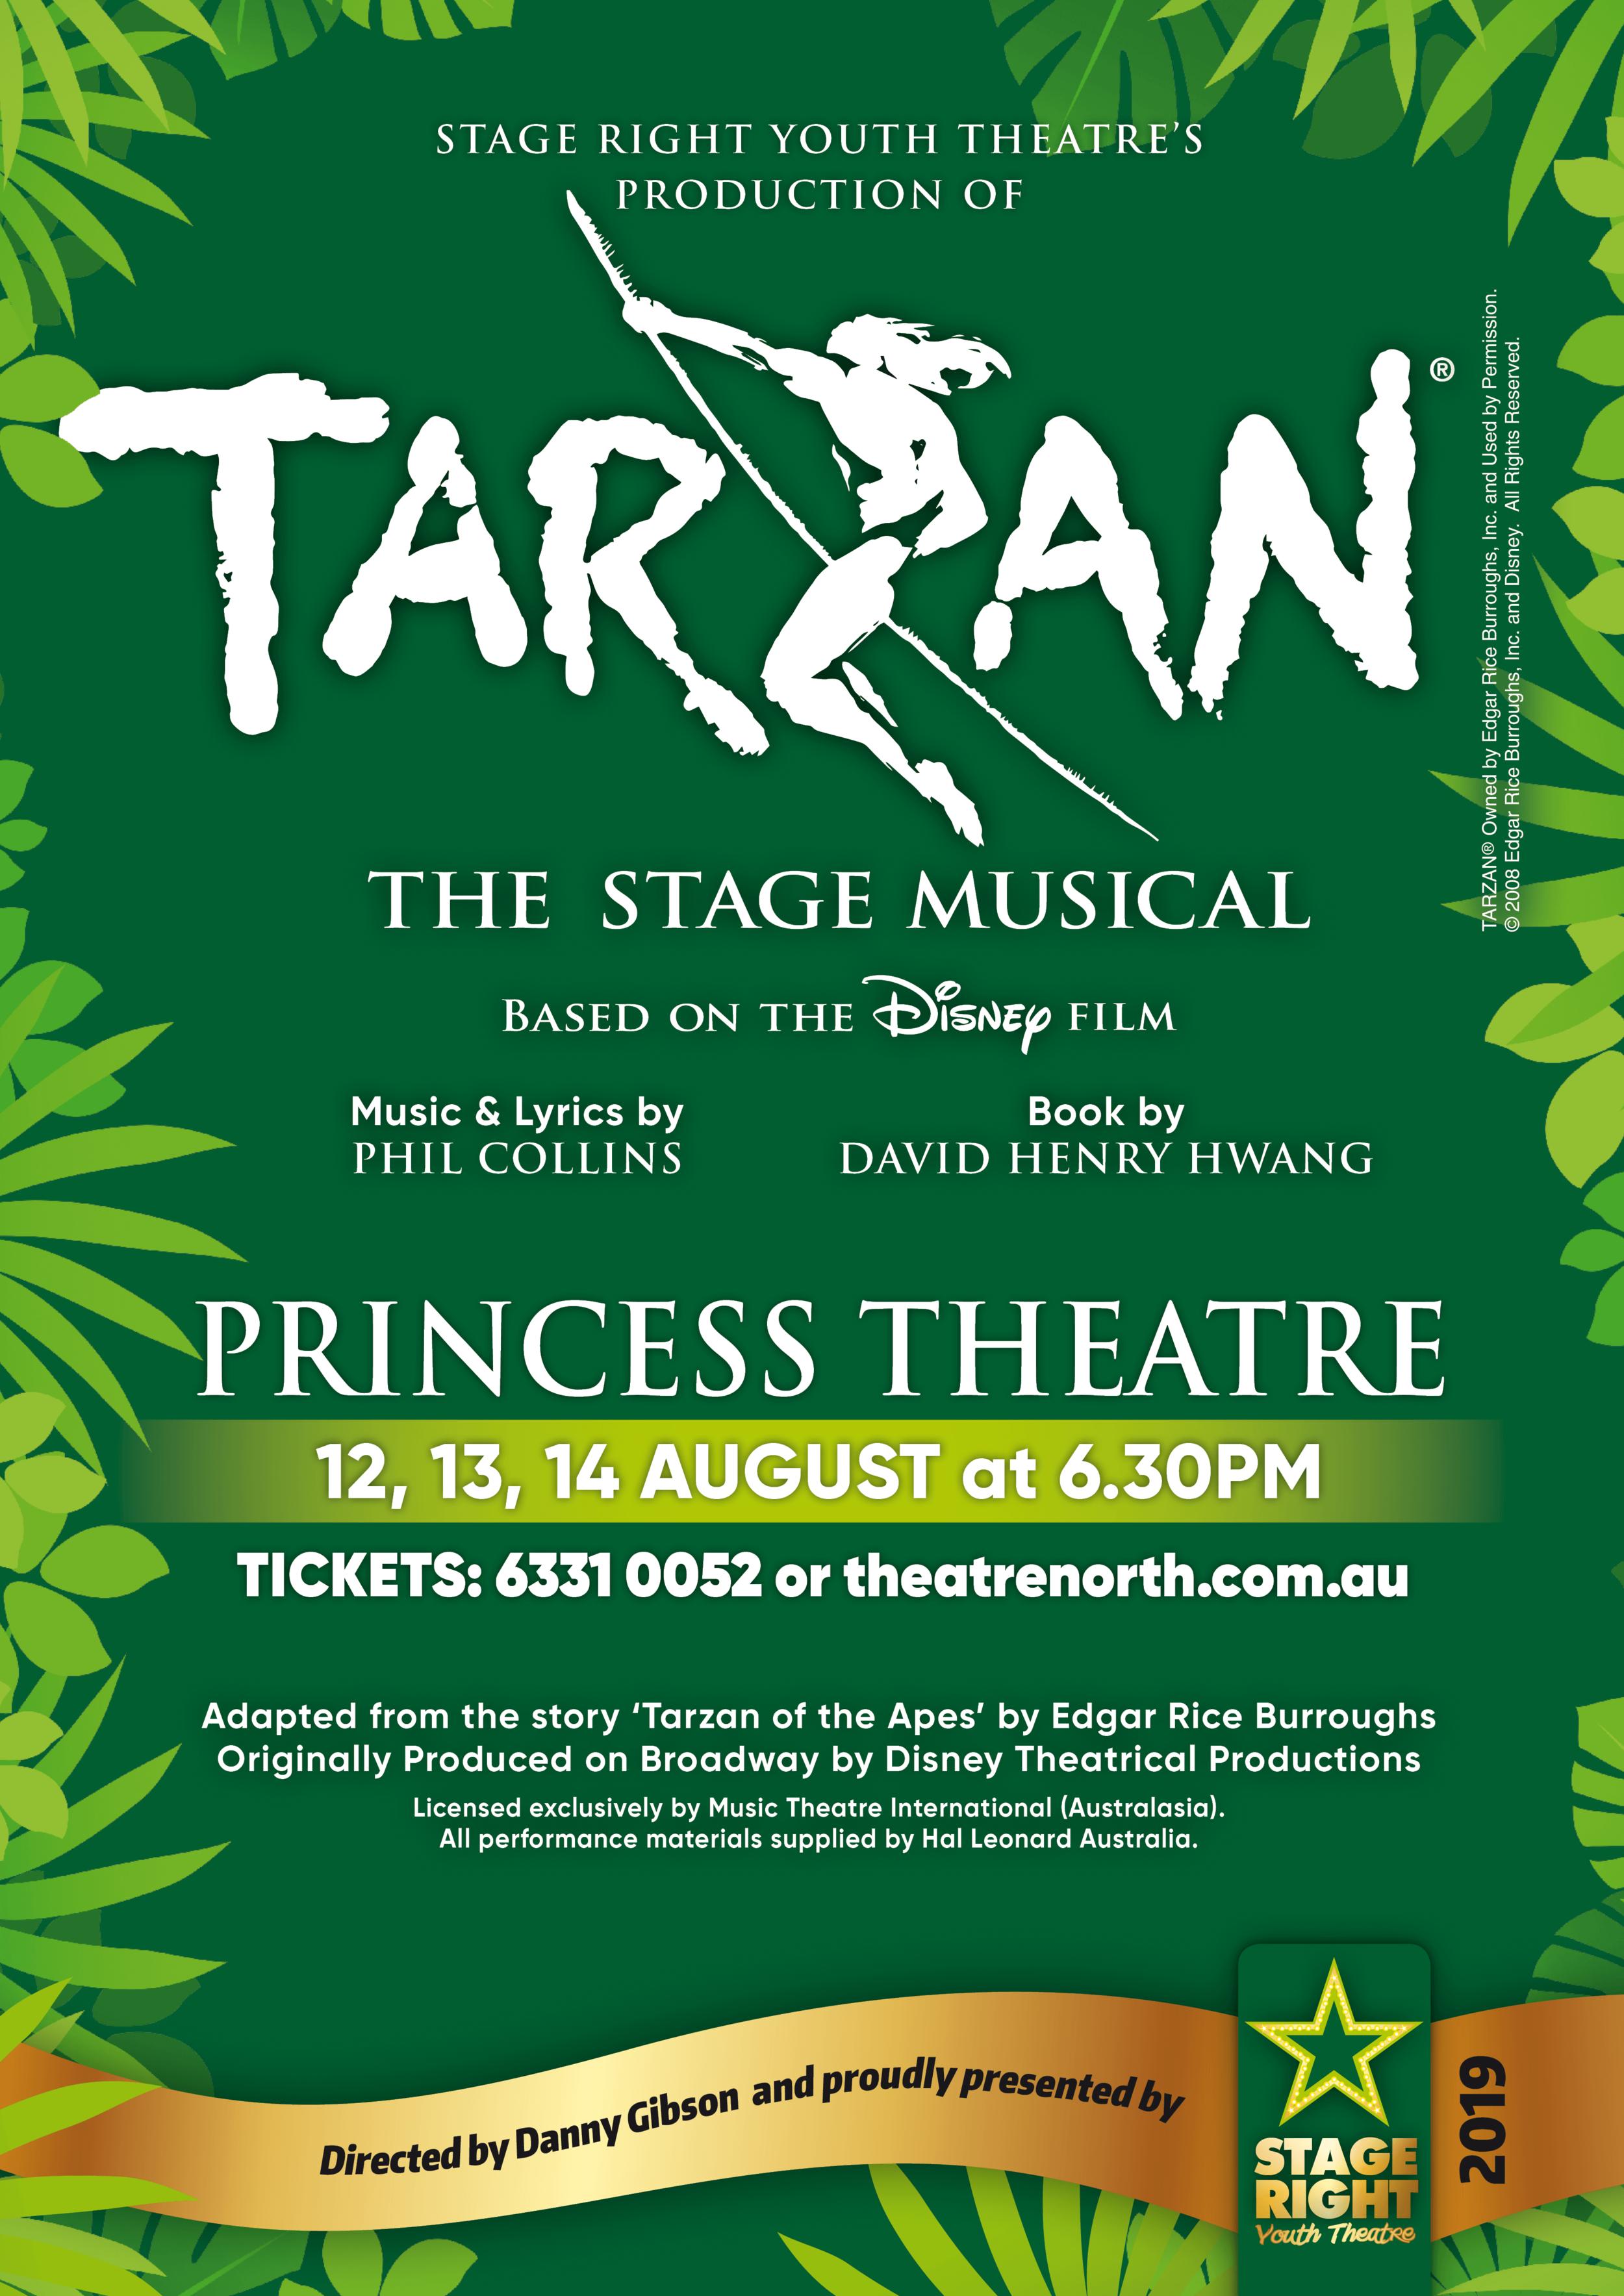 Tarzan A3 Poster_tinyjpg.png